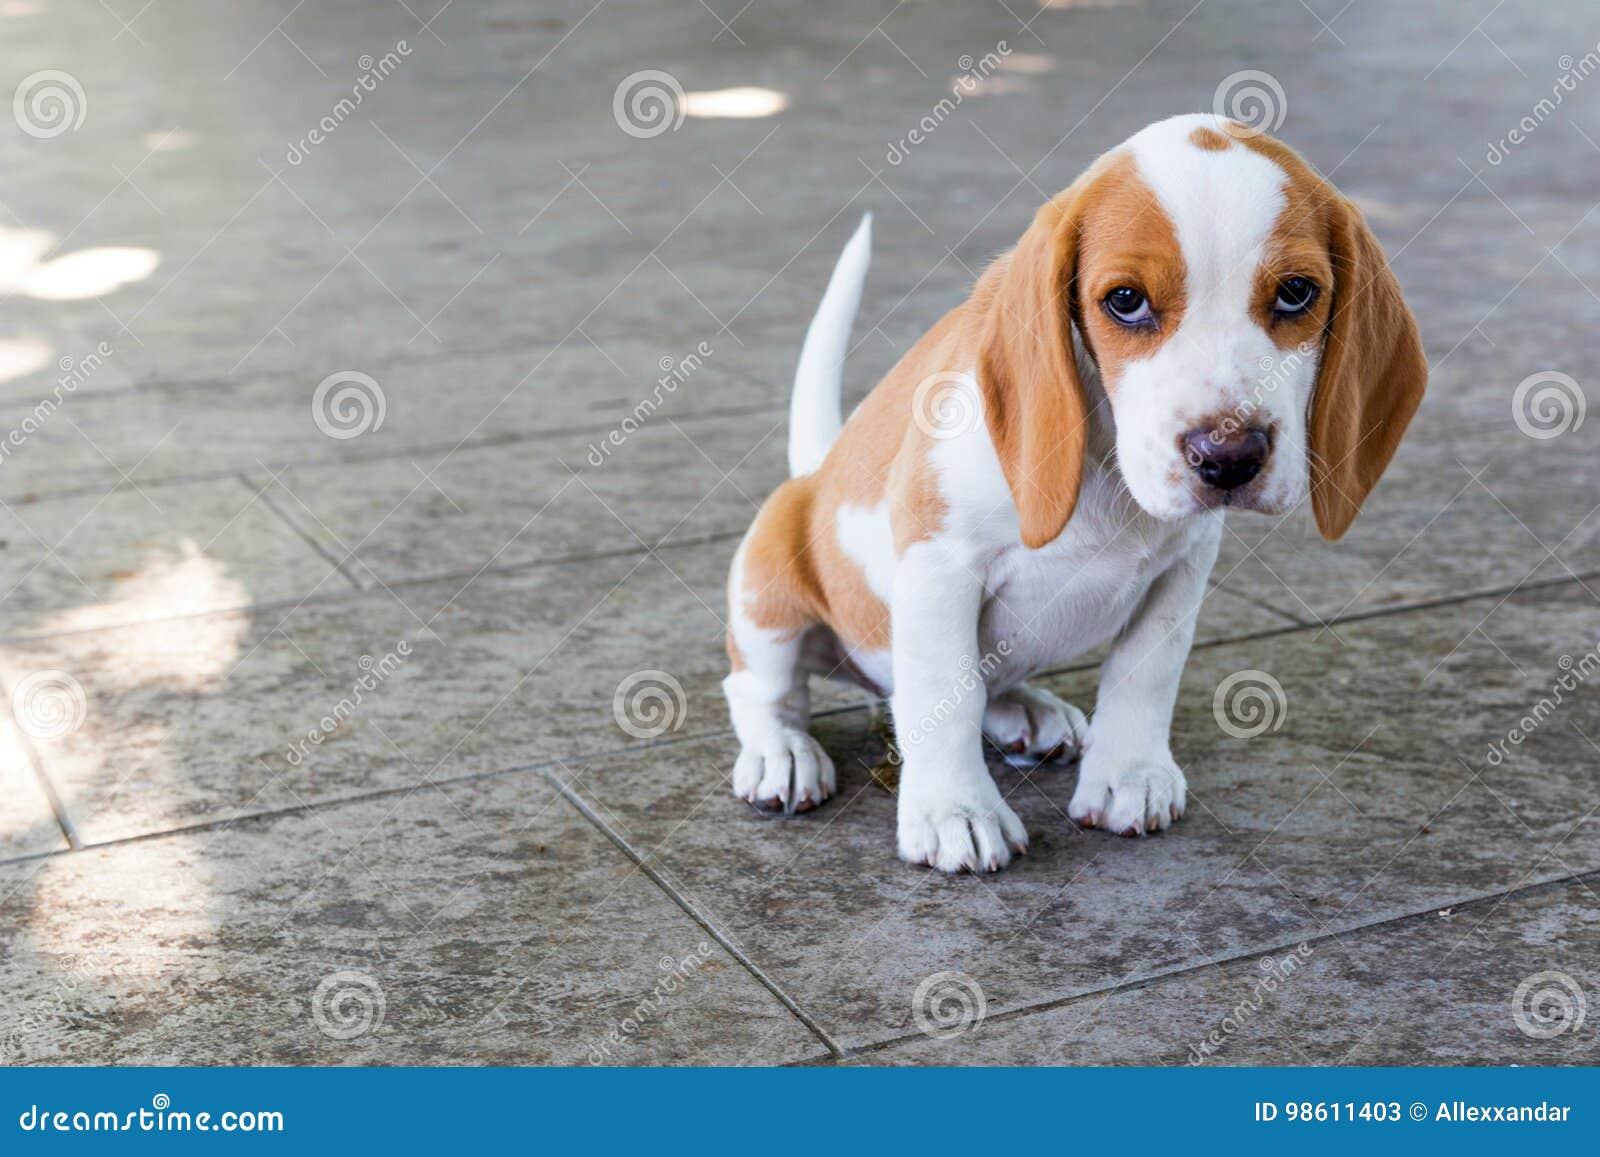 Small cute beagle puppy dog